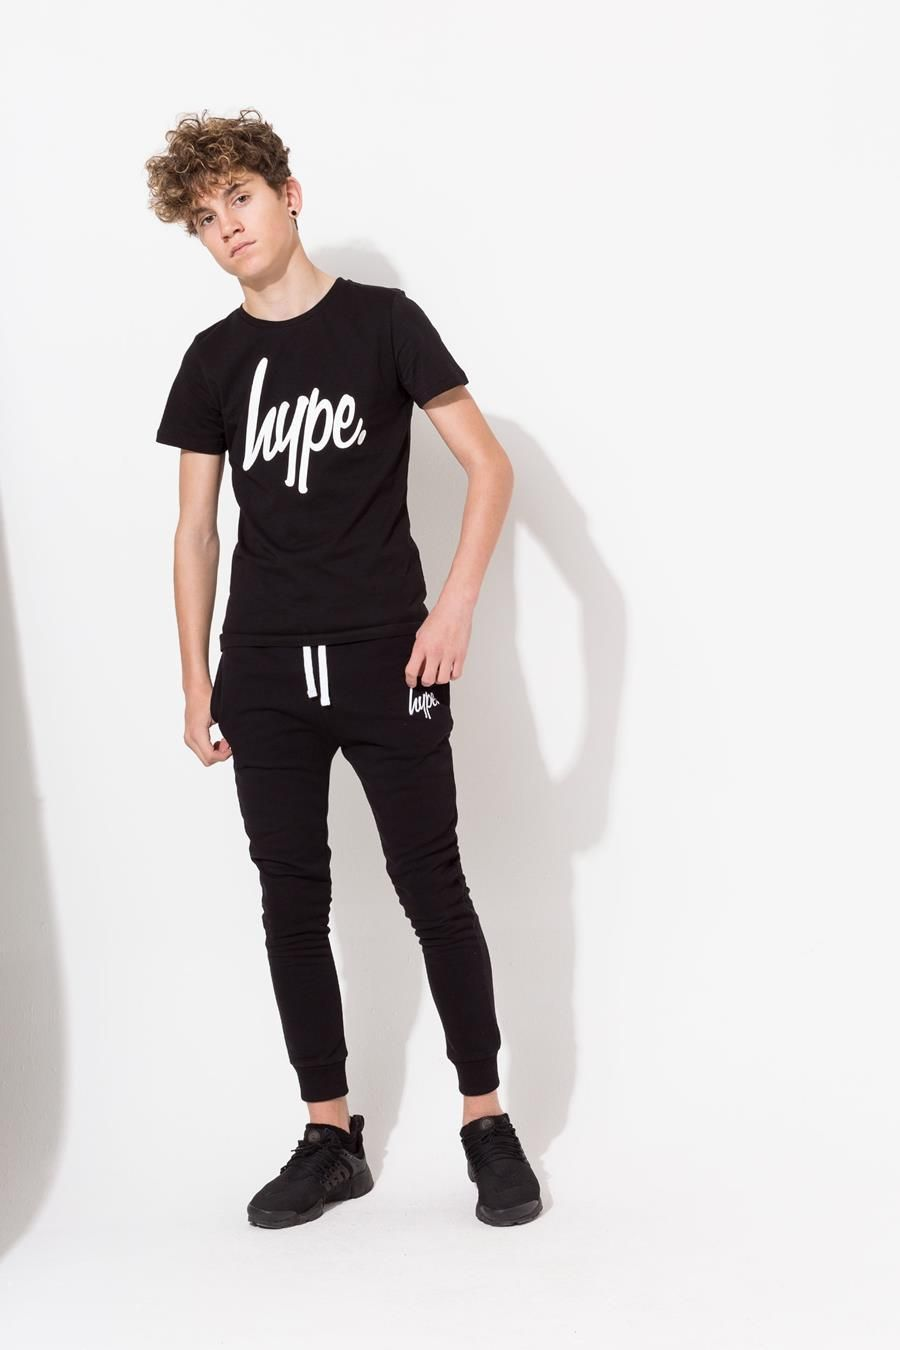 Hype Black Hype Script Kids T-Shirt